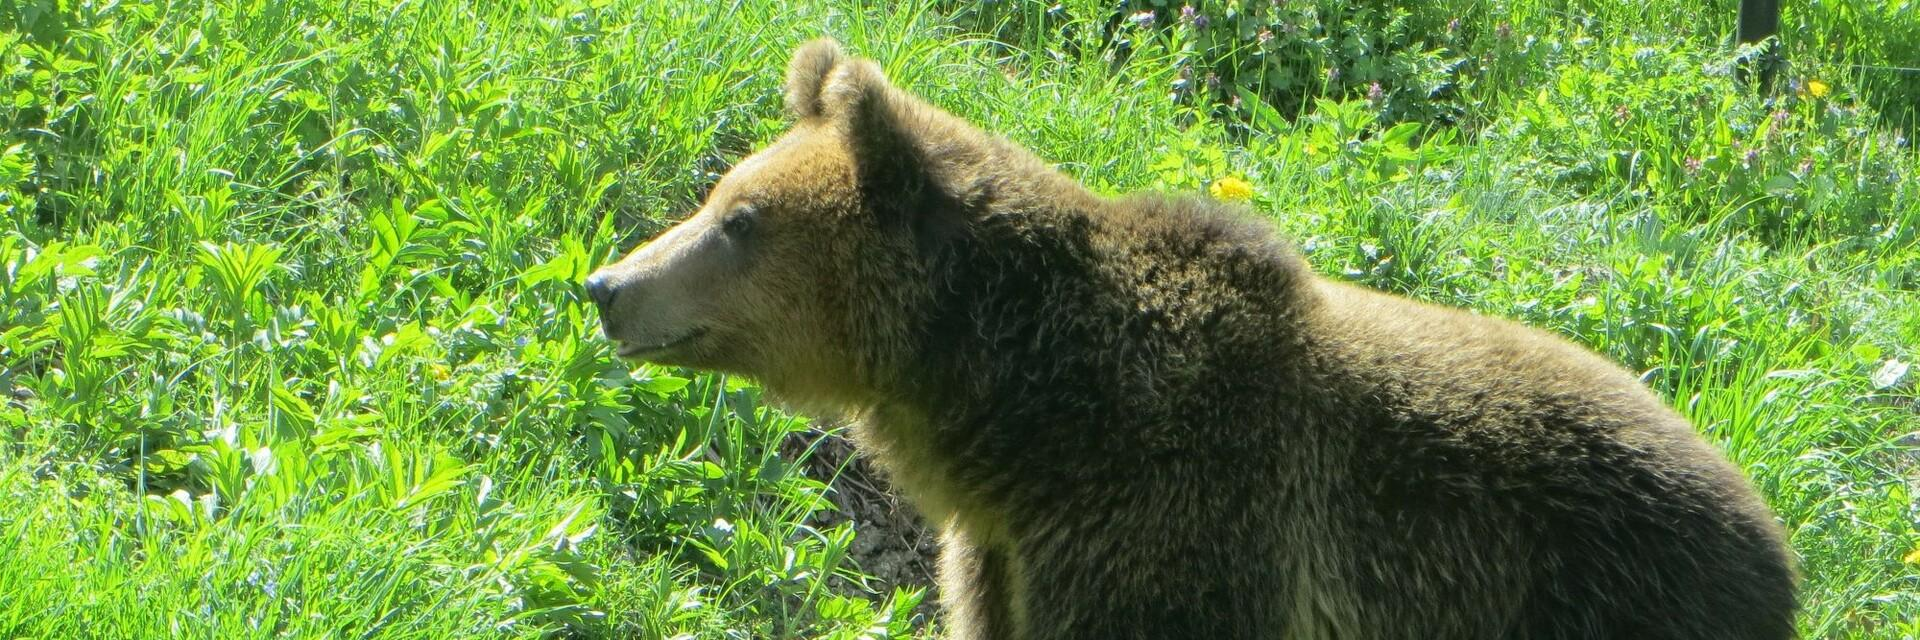 Happy bear runing